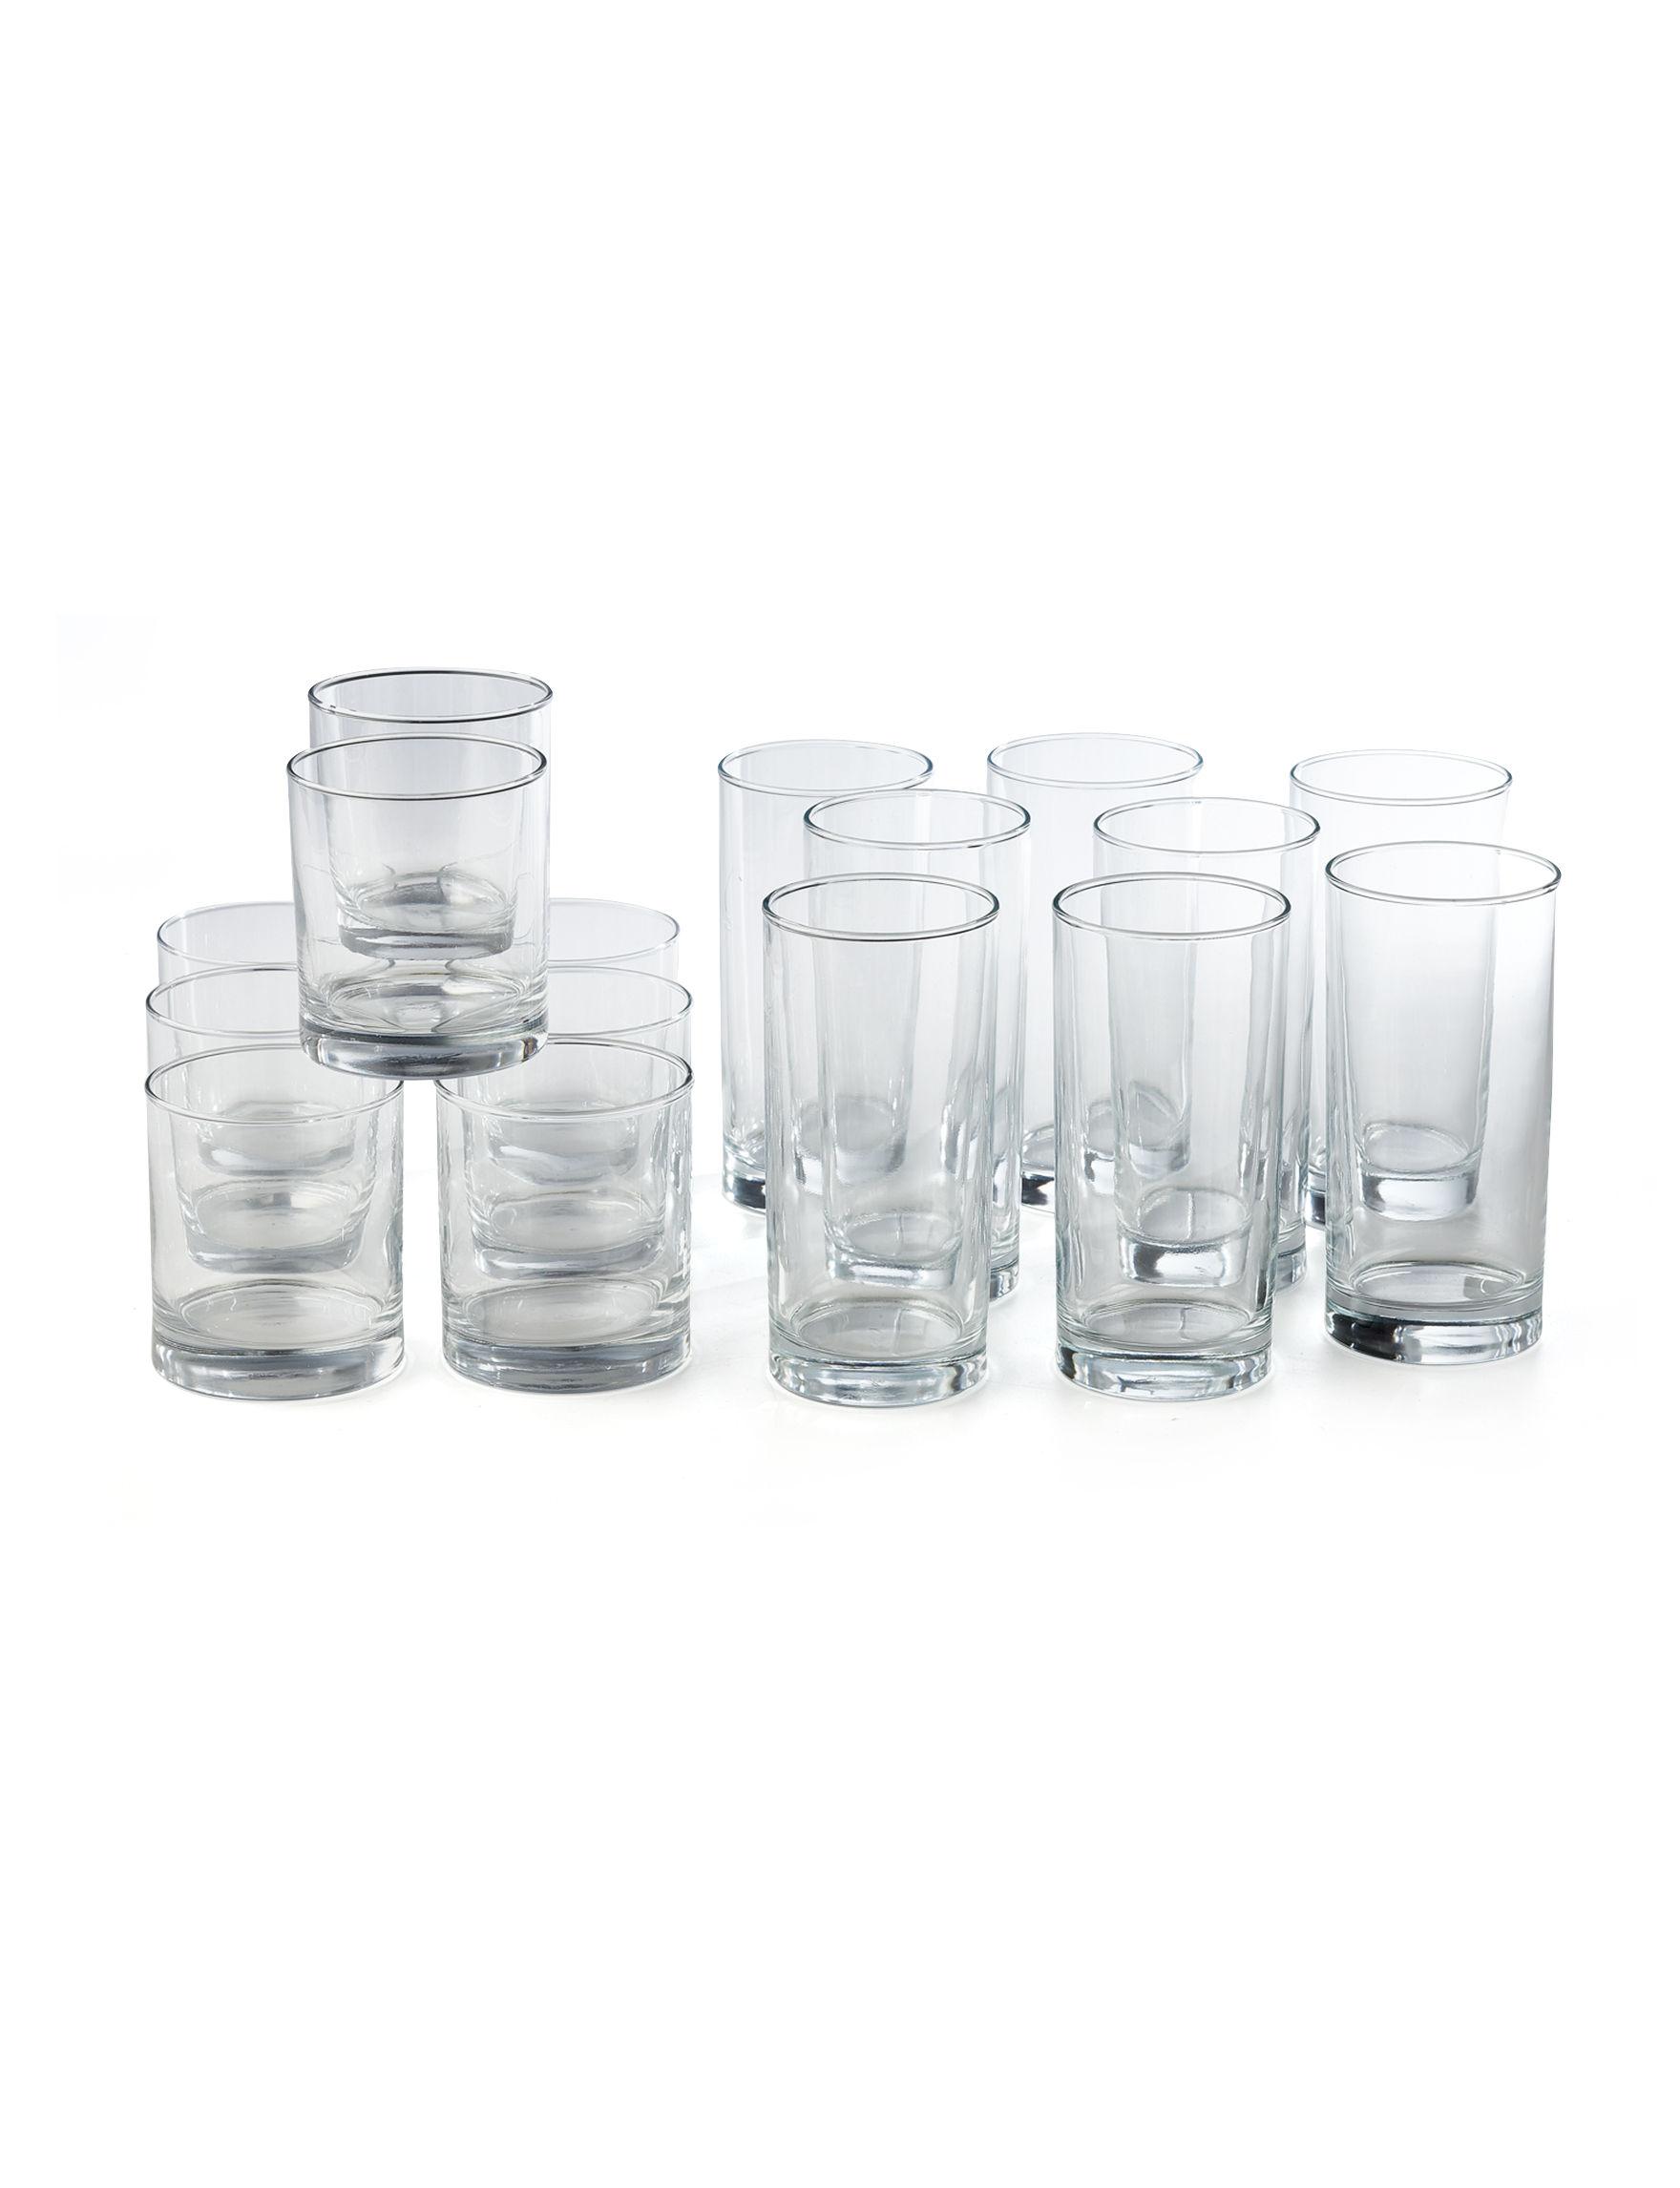 Libbey Glassware Clear Drinkware Sets Drinkware